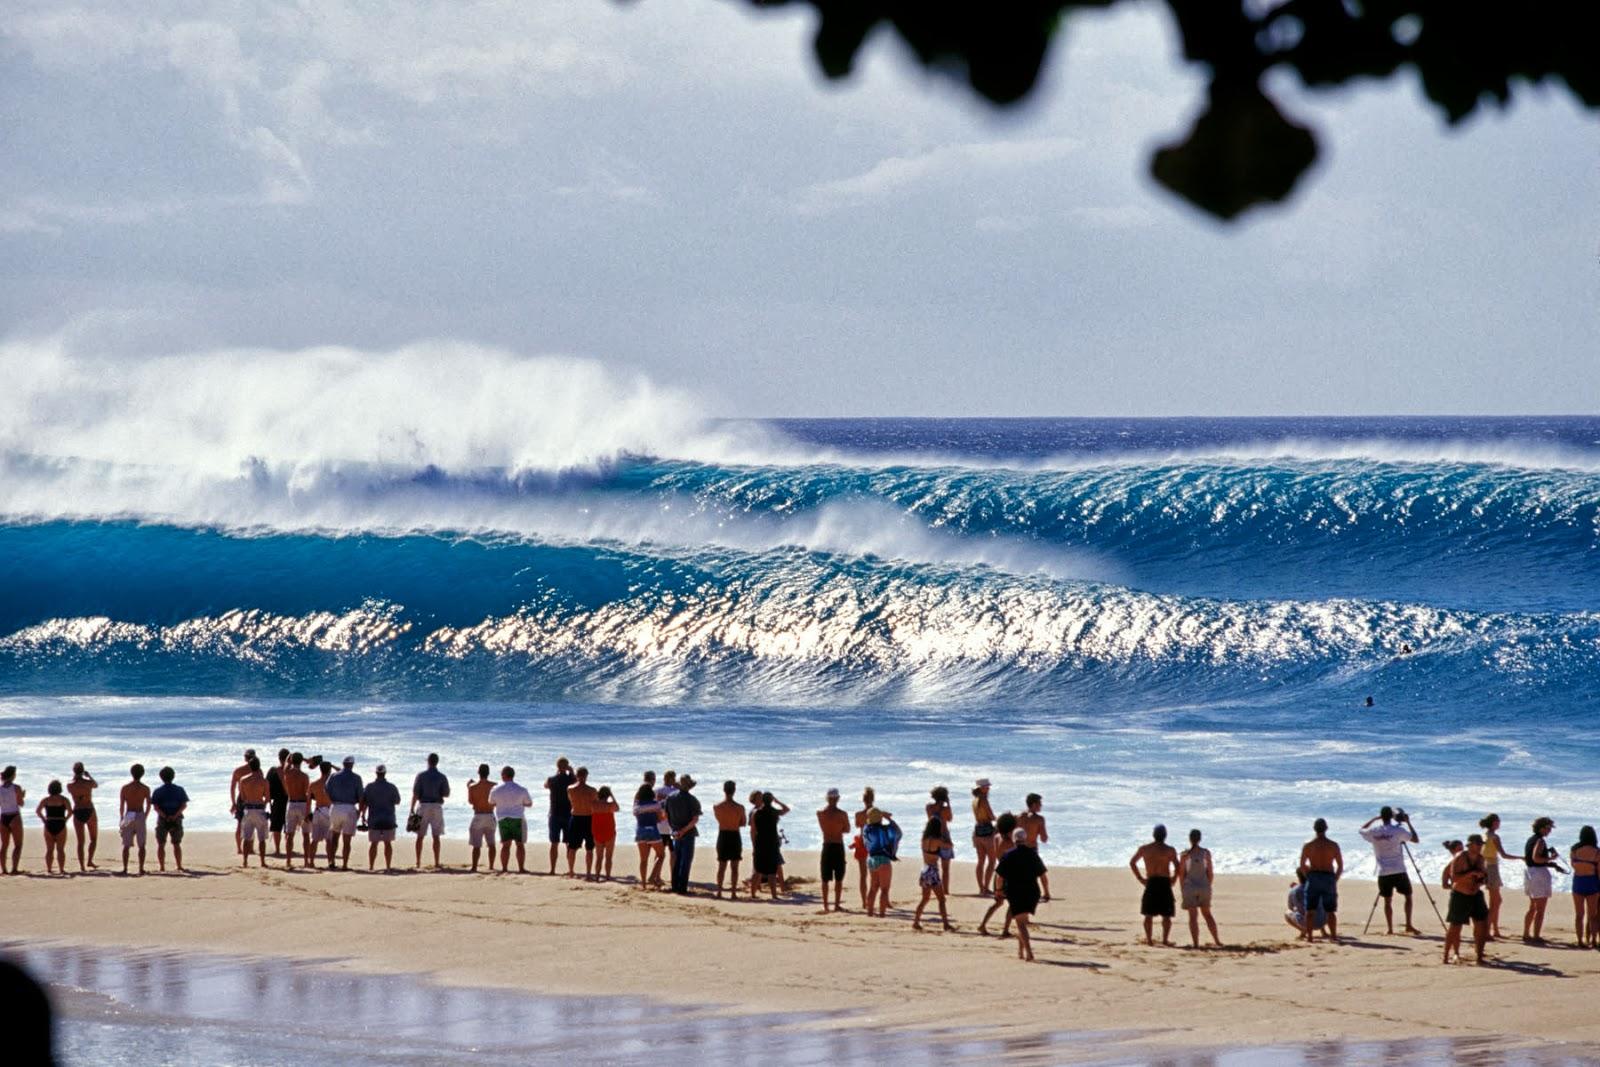 oahu-north-shore-waves-144.jpg